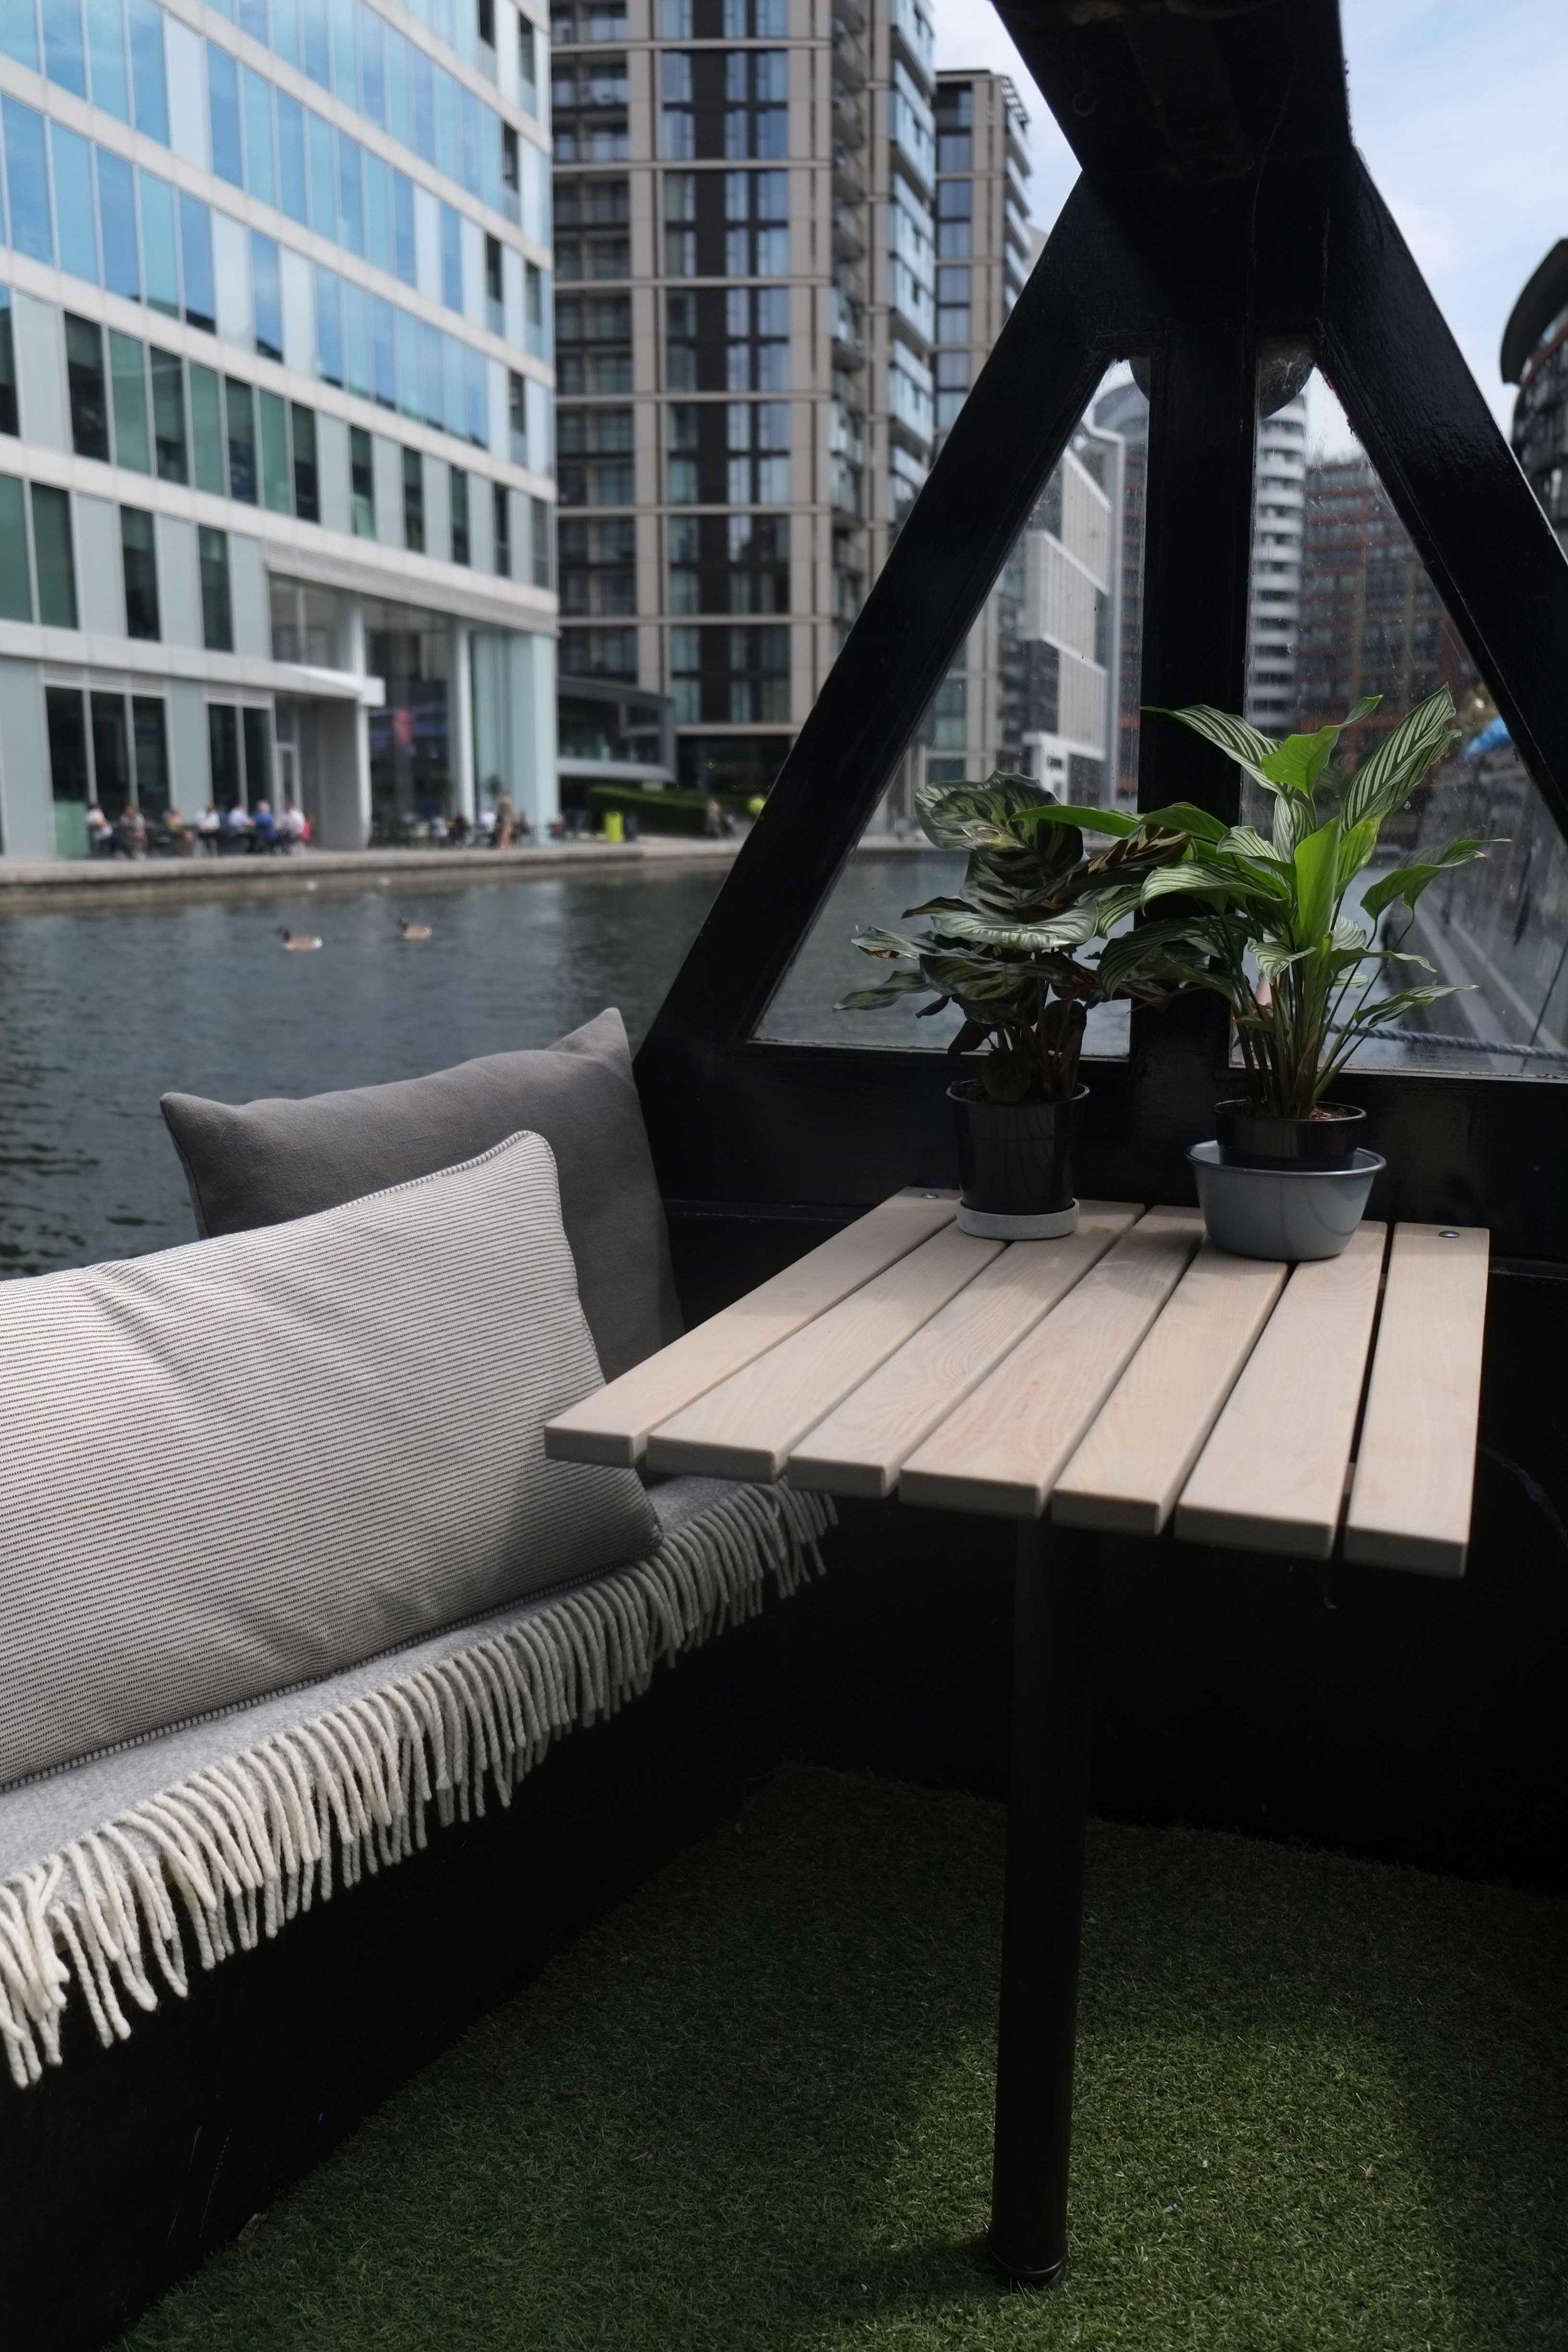 lunarlunar_interior_design_canal_boat_small_space_garden.jpg